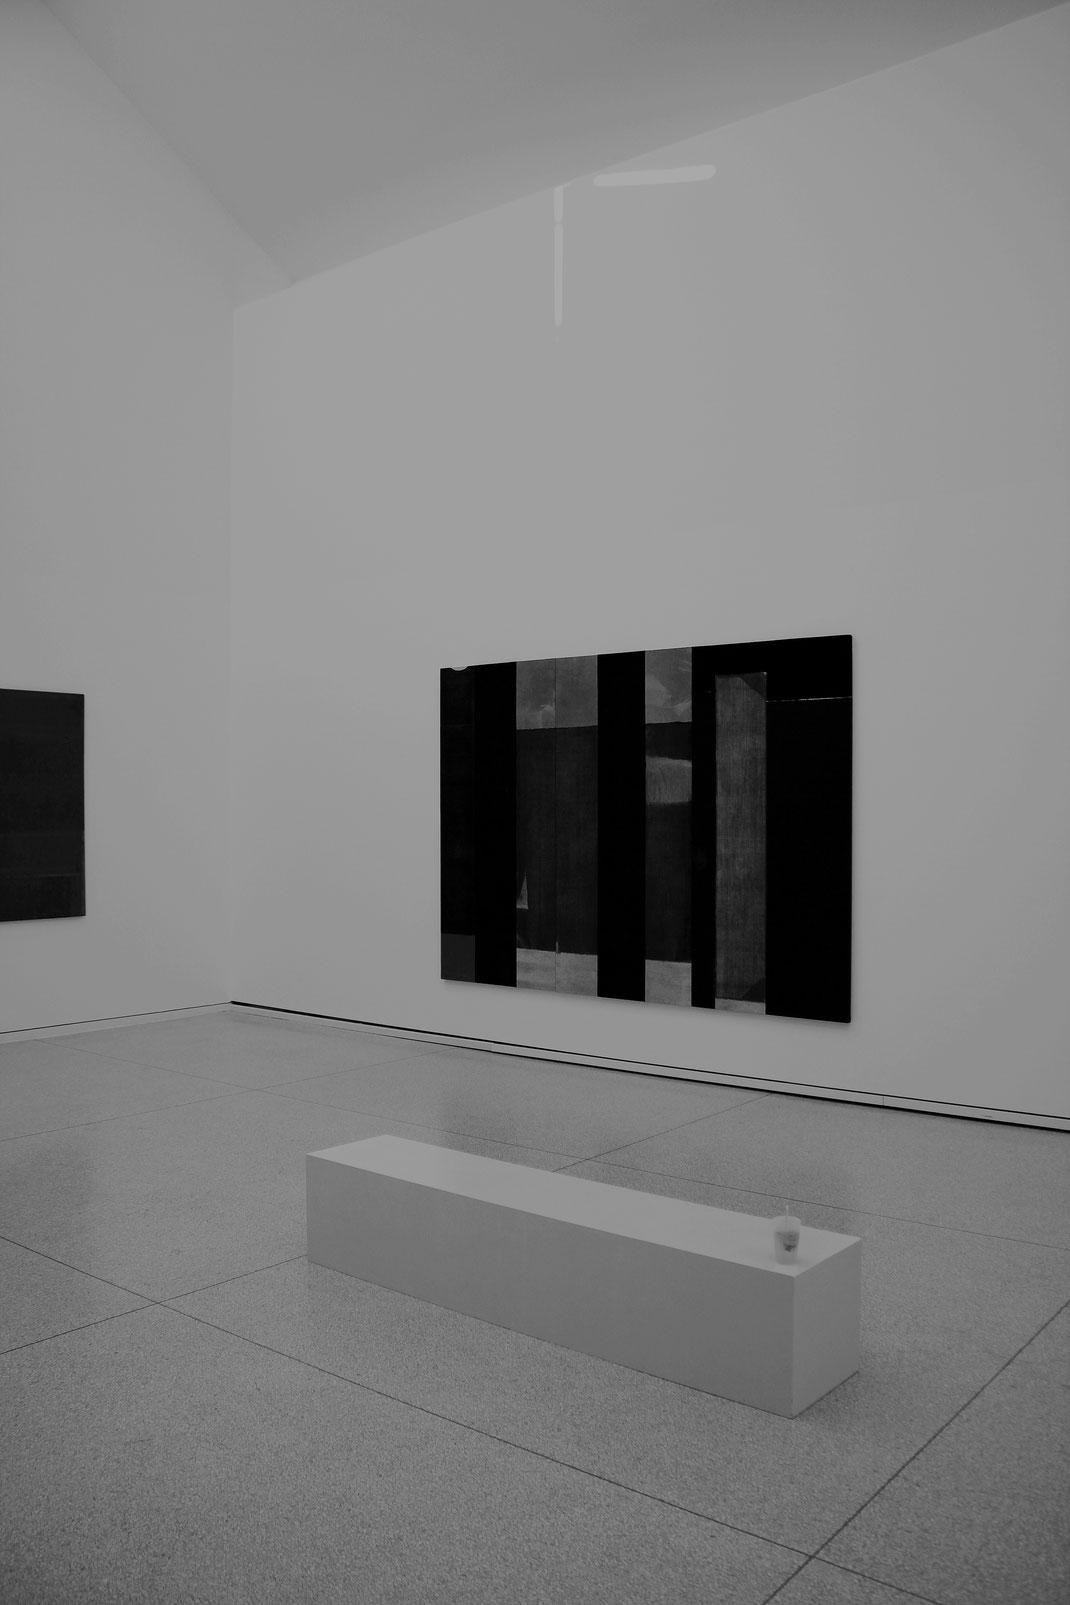 Zuhra Hilal Heidelberger Kunstverein Laura Deberle Heidelberg